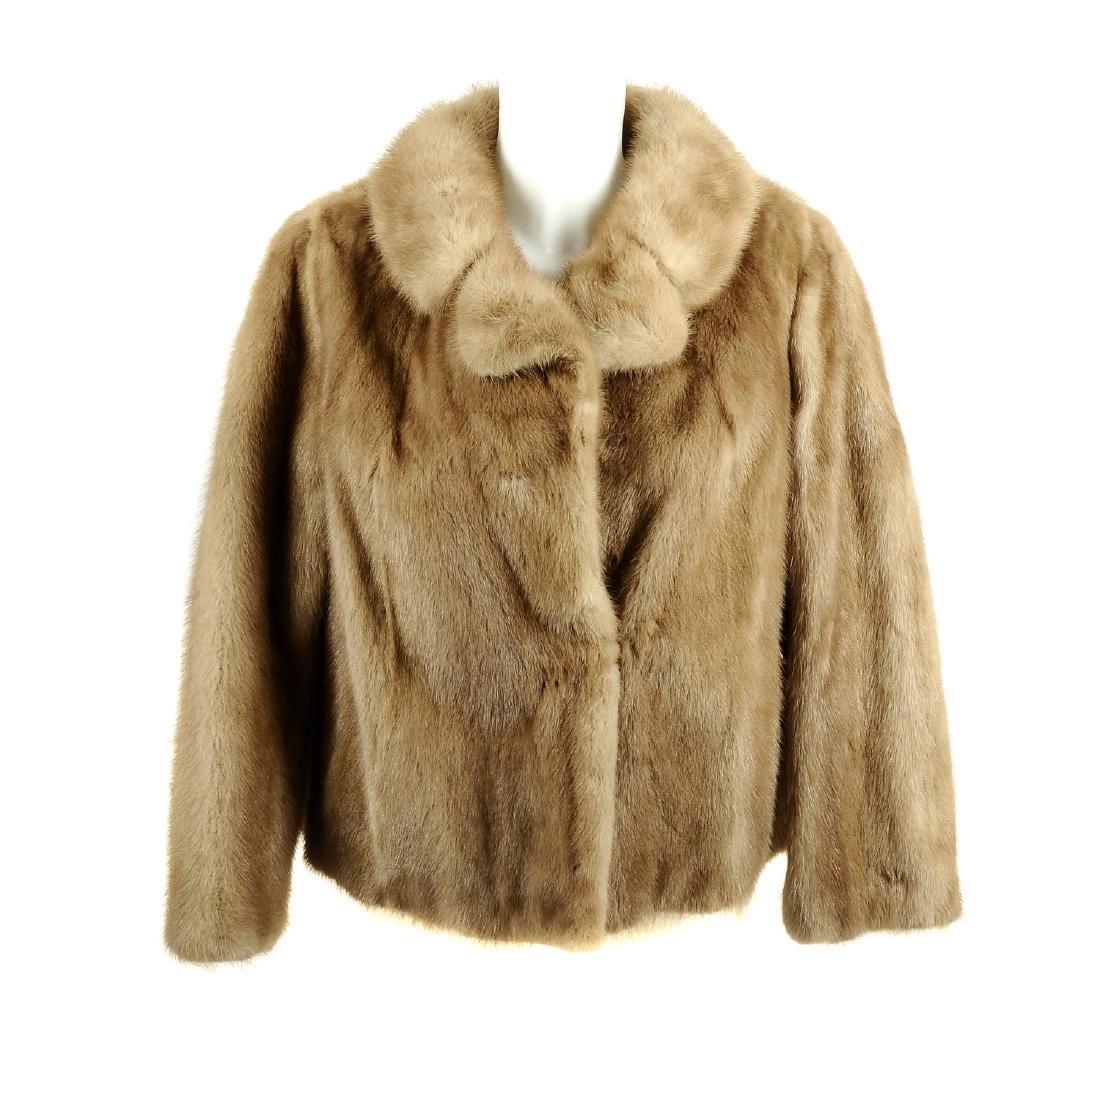 A mink fur jacket. Designed with a notched lapel